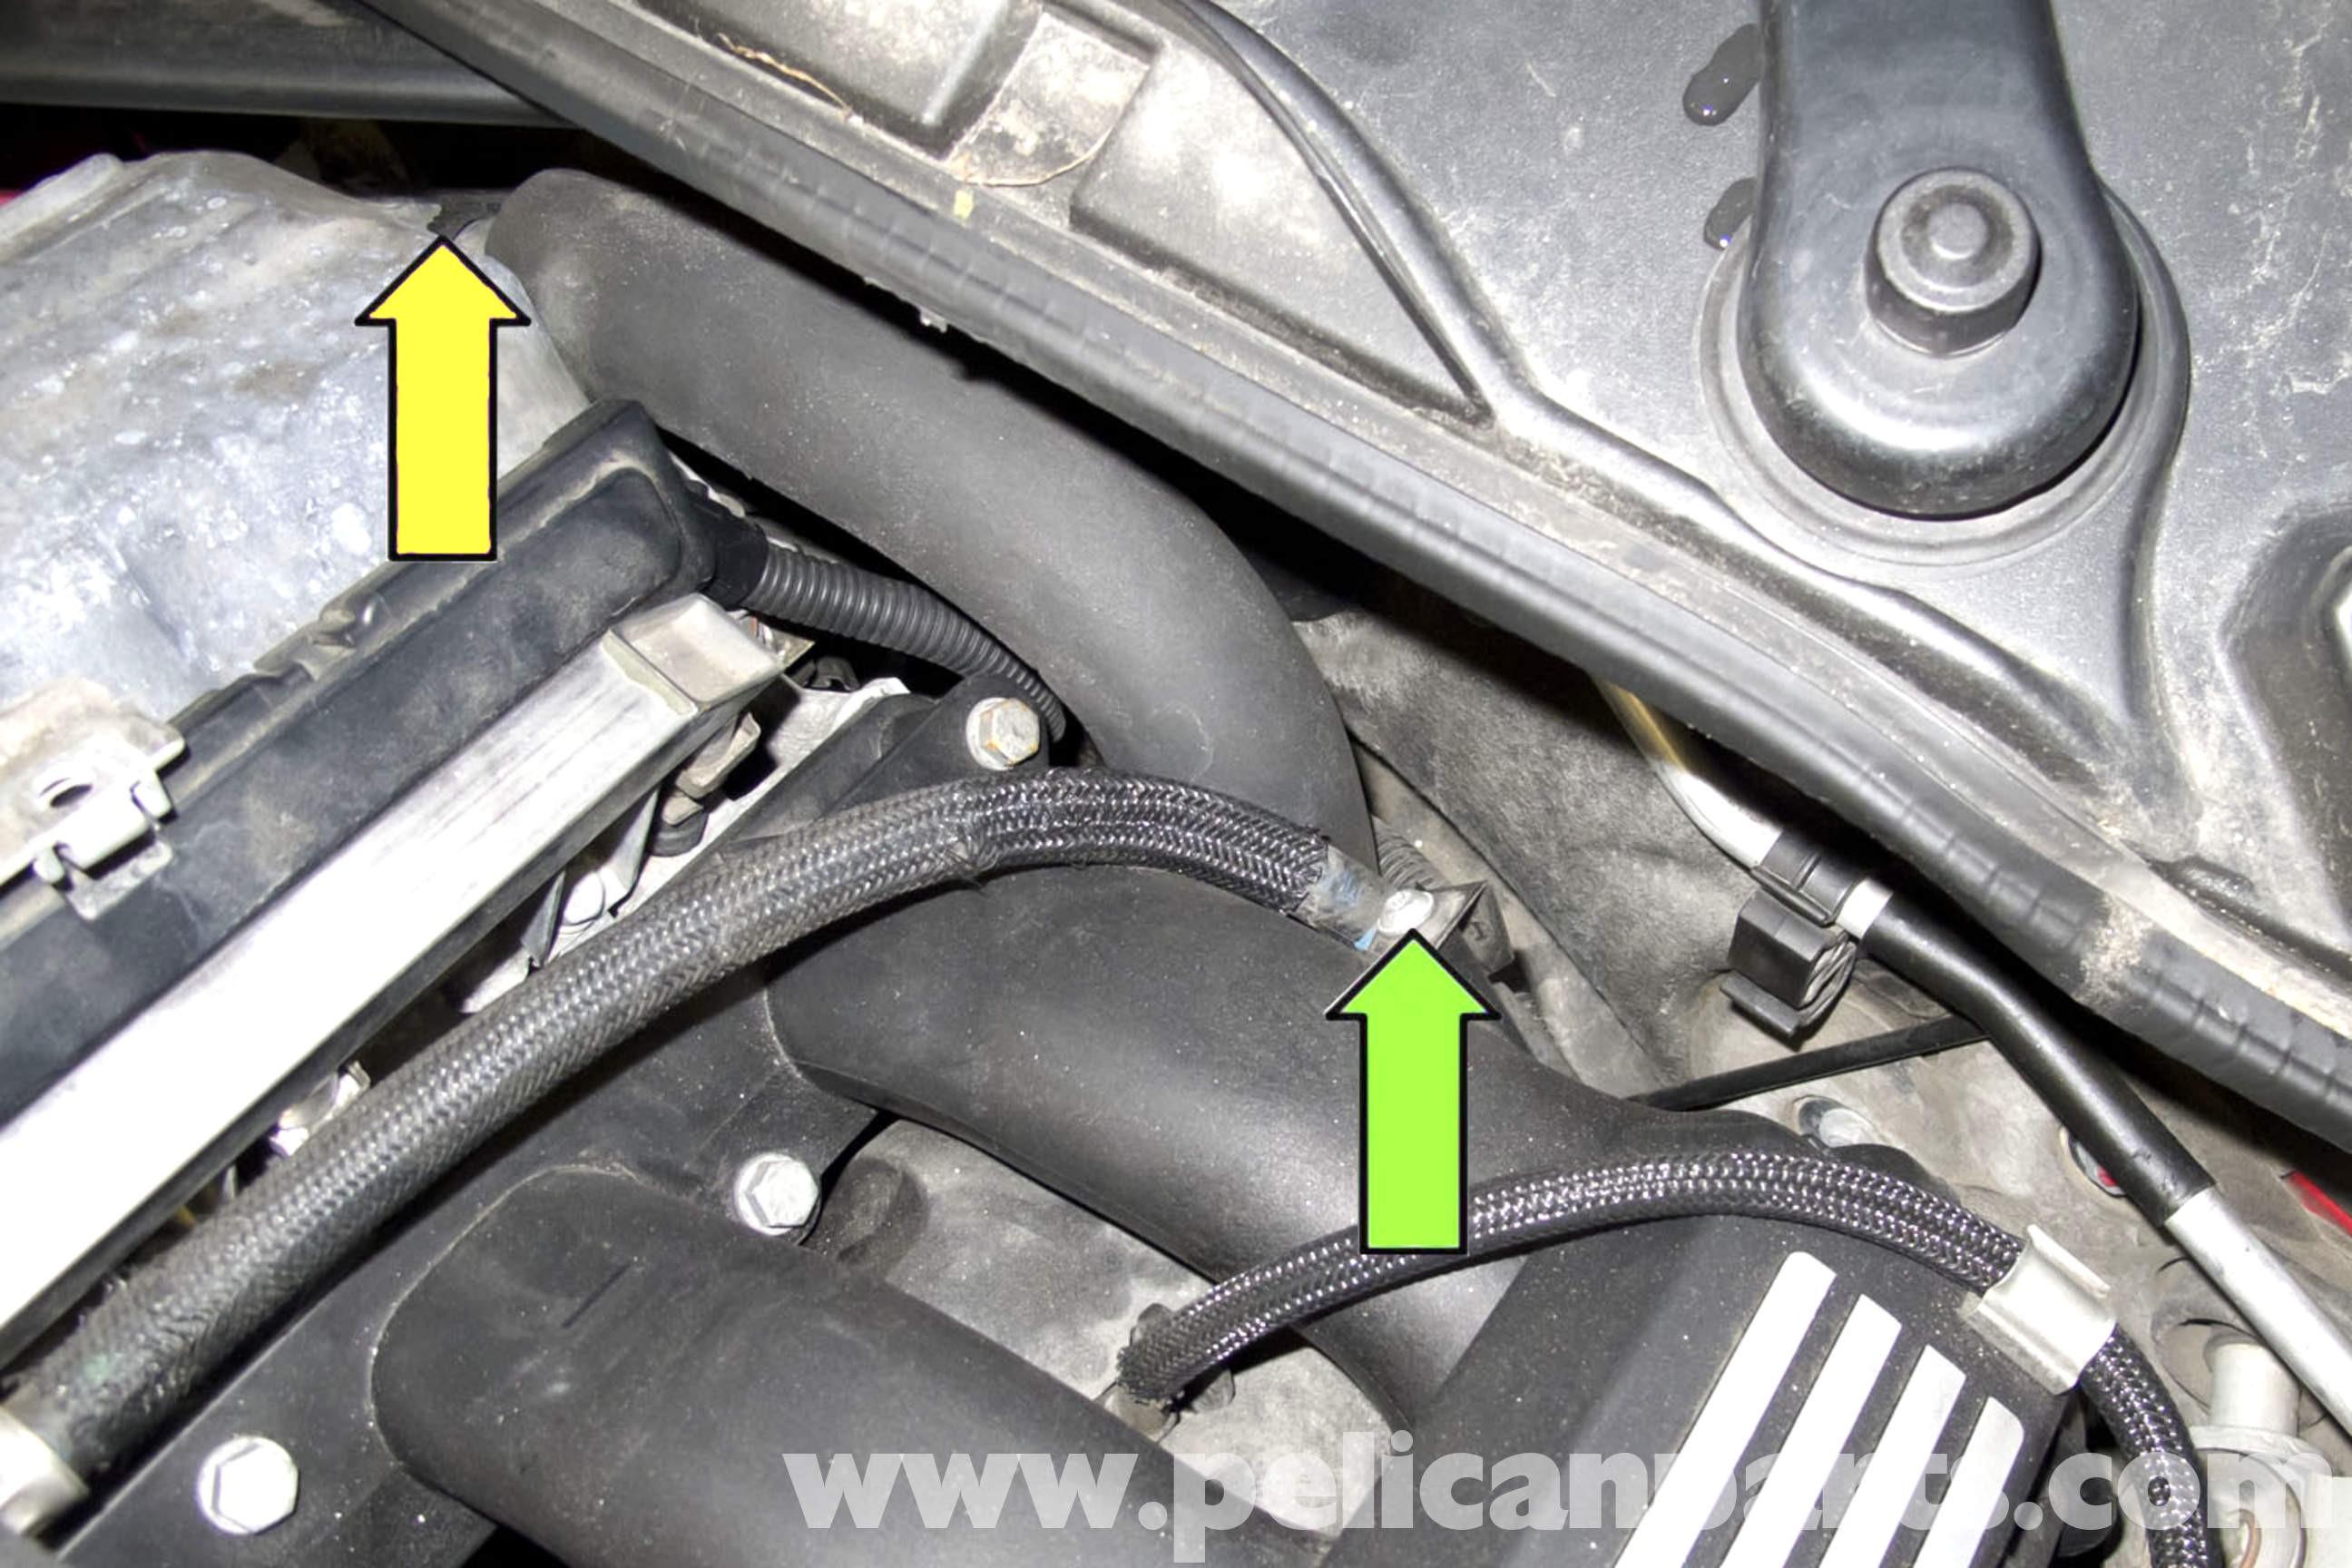 2008 Bmw 328i Engine Diagram Bmw E90 Intake Manifold Replacement E91 E92 E93 Of 2008 Bmw 328i Engine Diagram